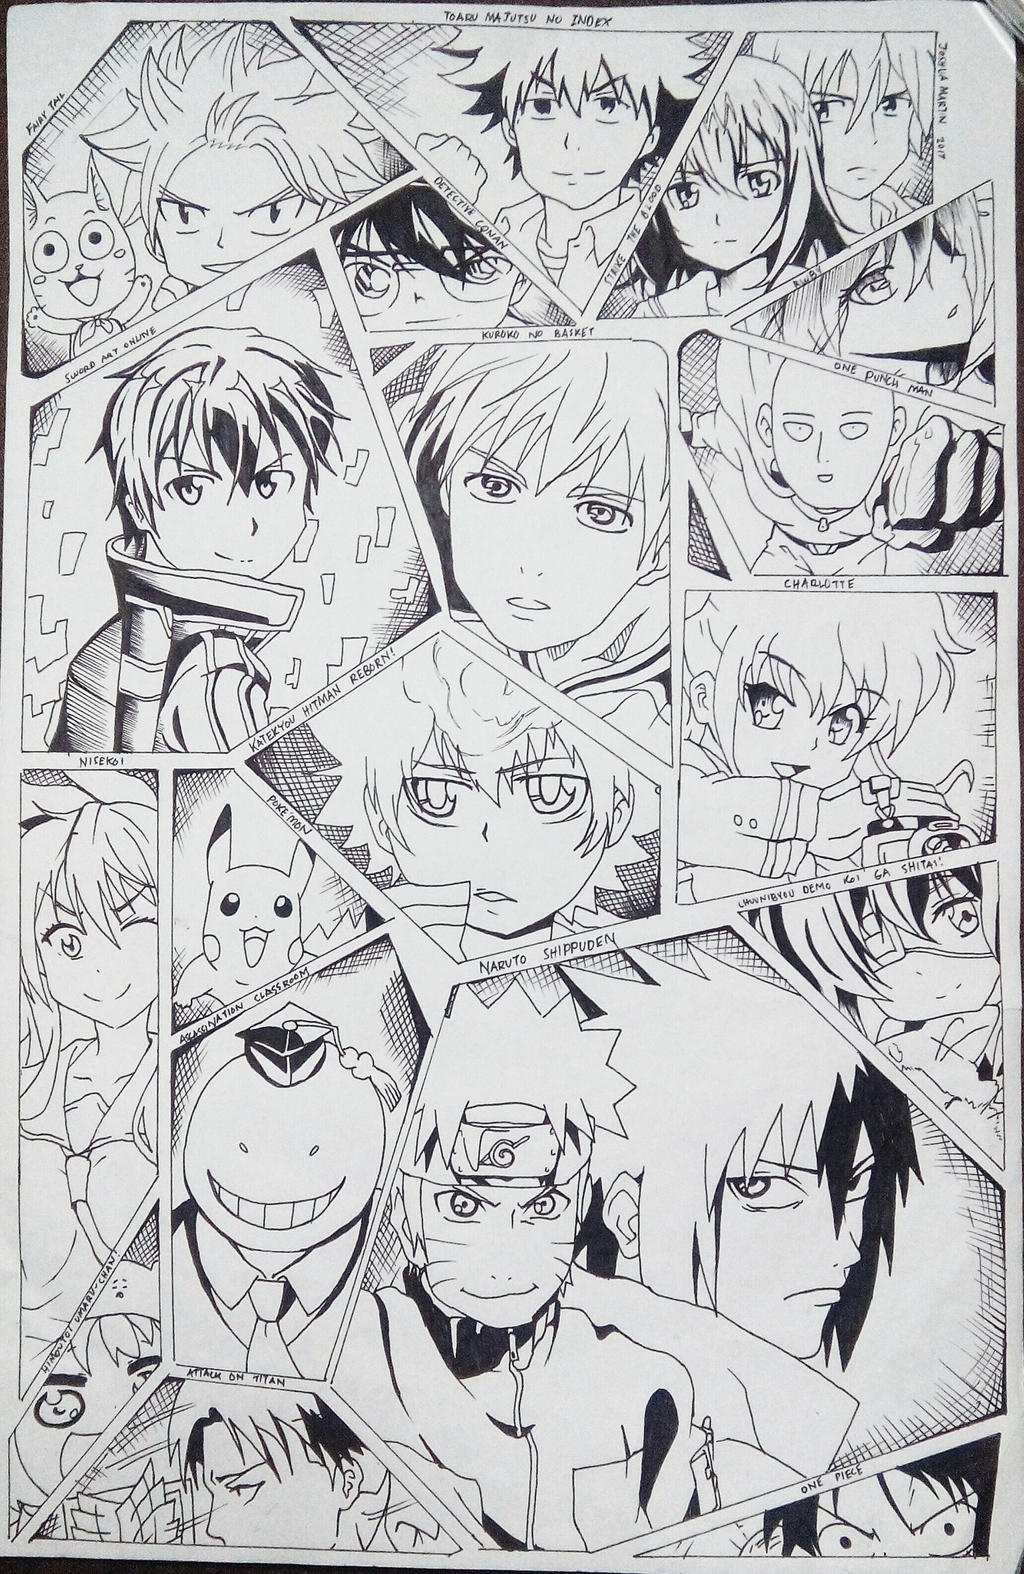 Anime manga collage drawing by josh18parker